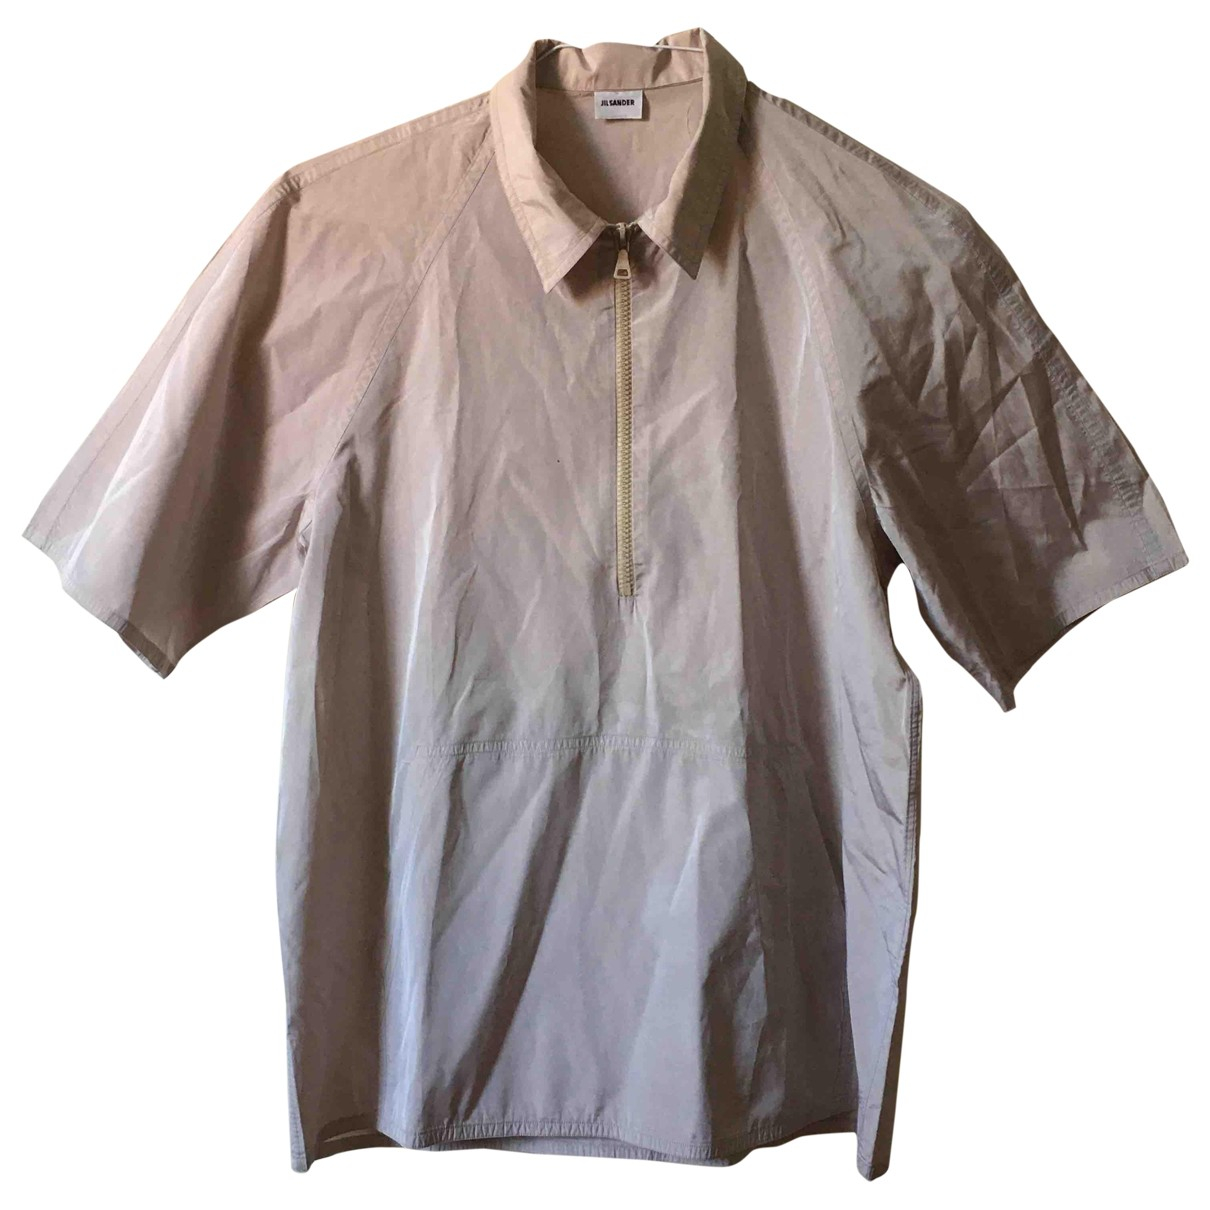 Jil Sander \N Pink Shirts for Men 42 EU (tour de cou / collar)